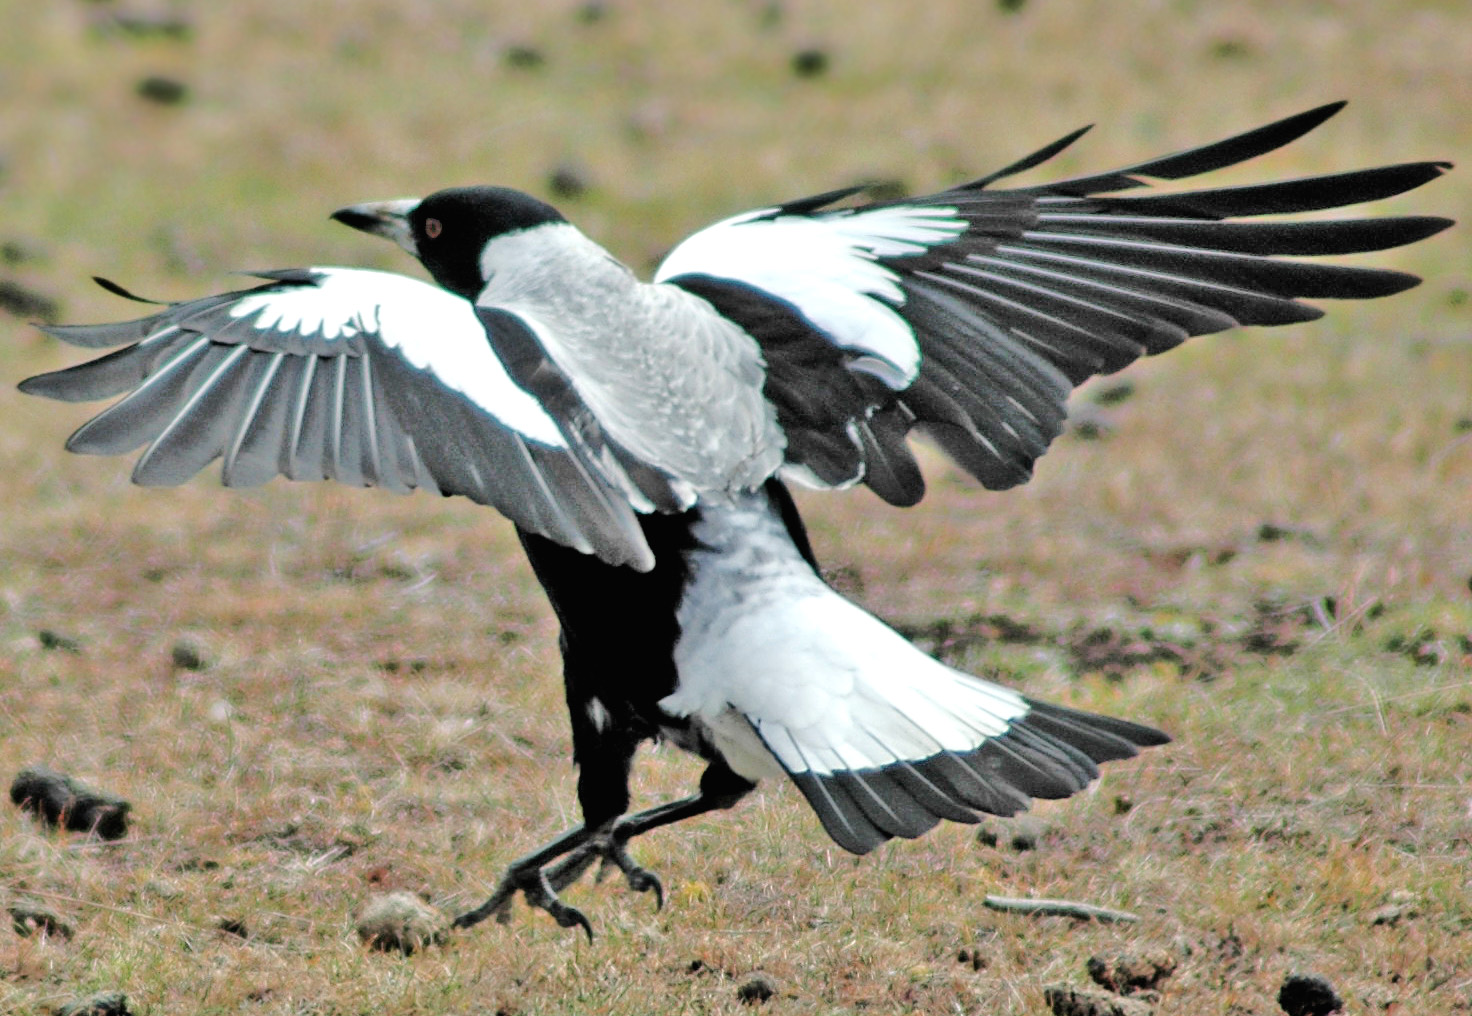 Magpie landing - photo#13